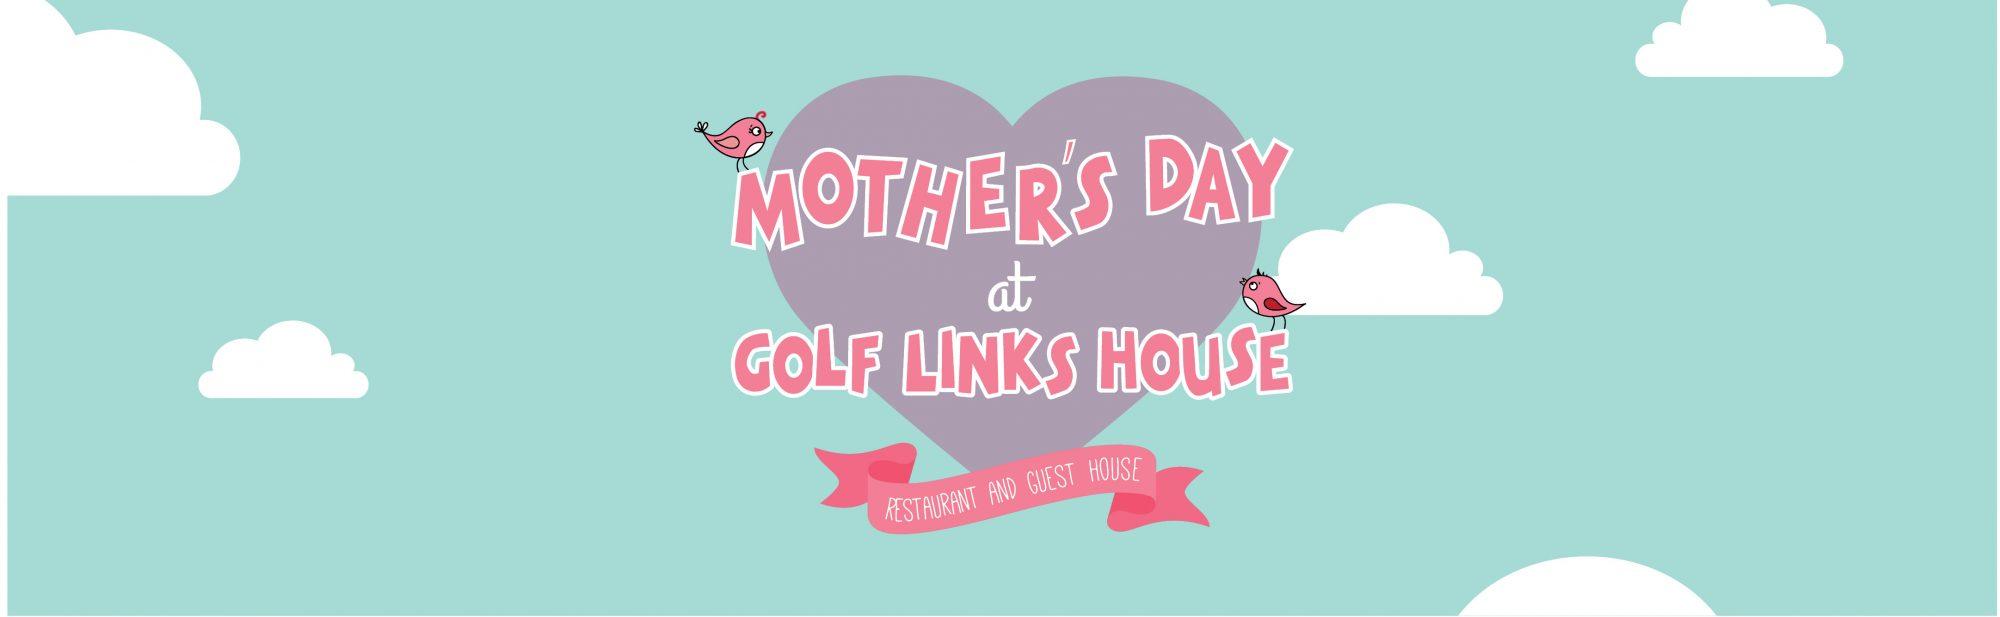 Golf Links House – Restaurant & Guest House